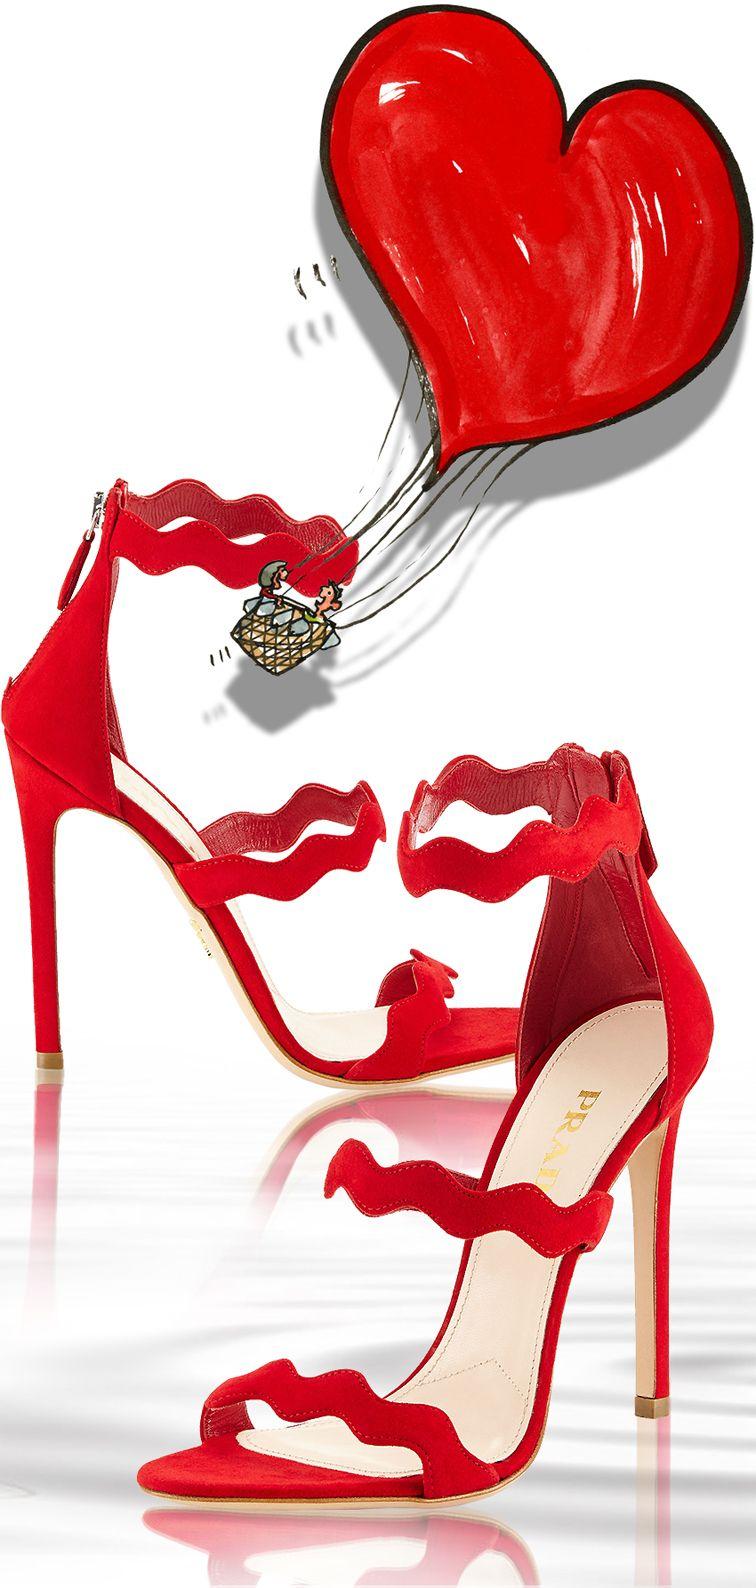 DOROTHY DOROTHY DOROTHY JOHNSOed Chaussures Groupintereshaussure dfd3b8